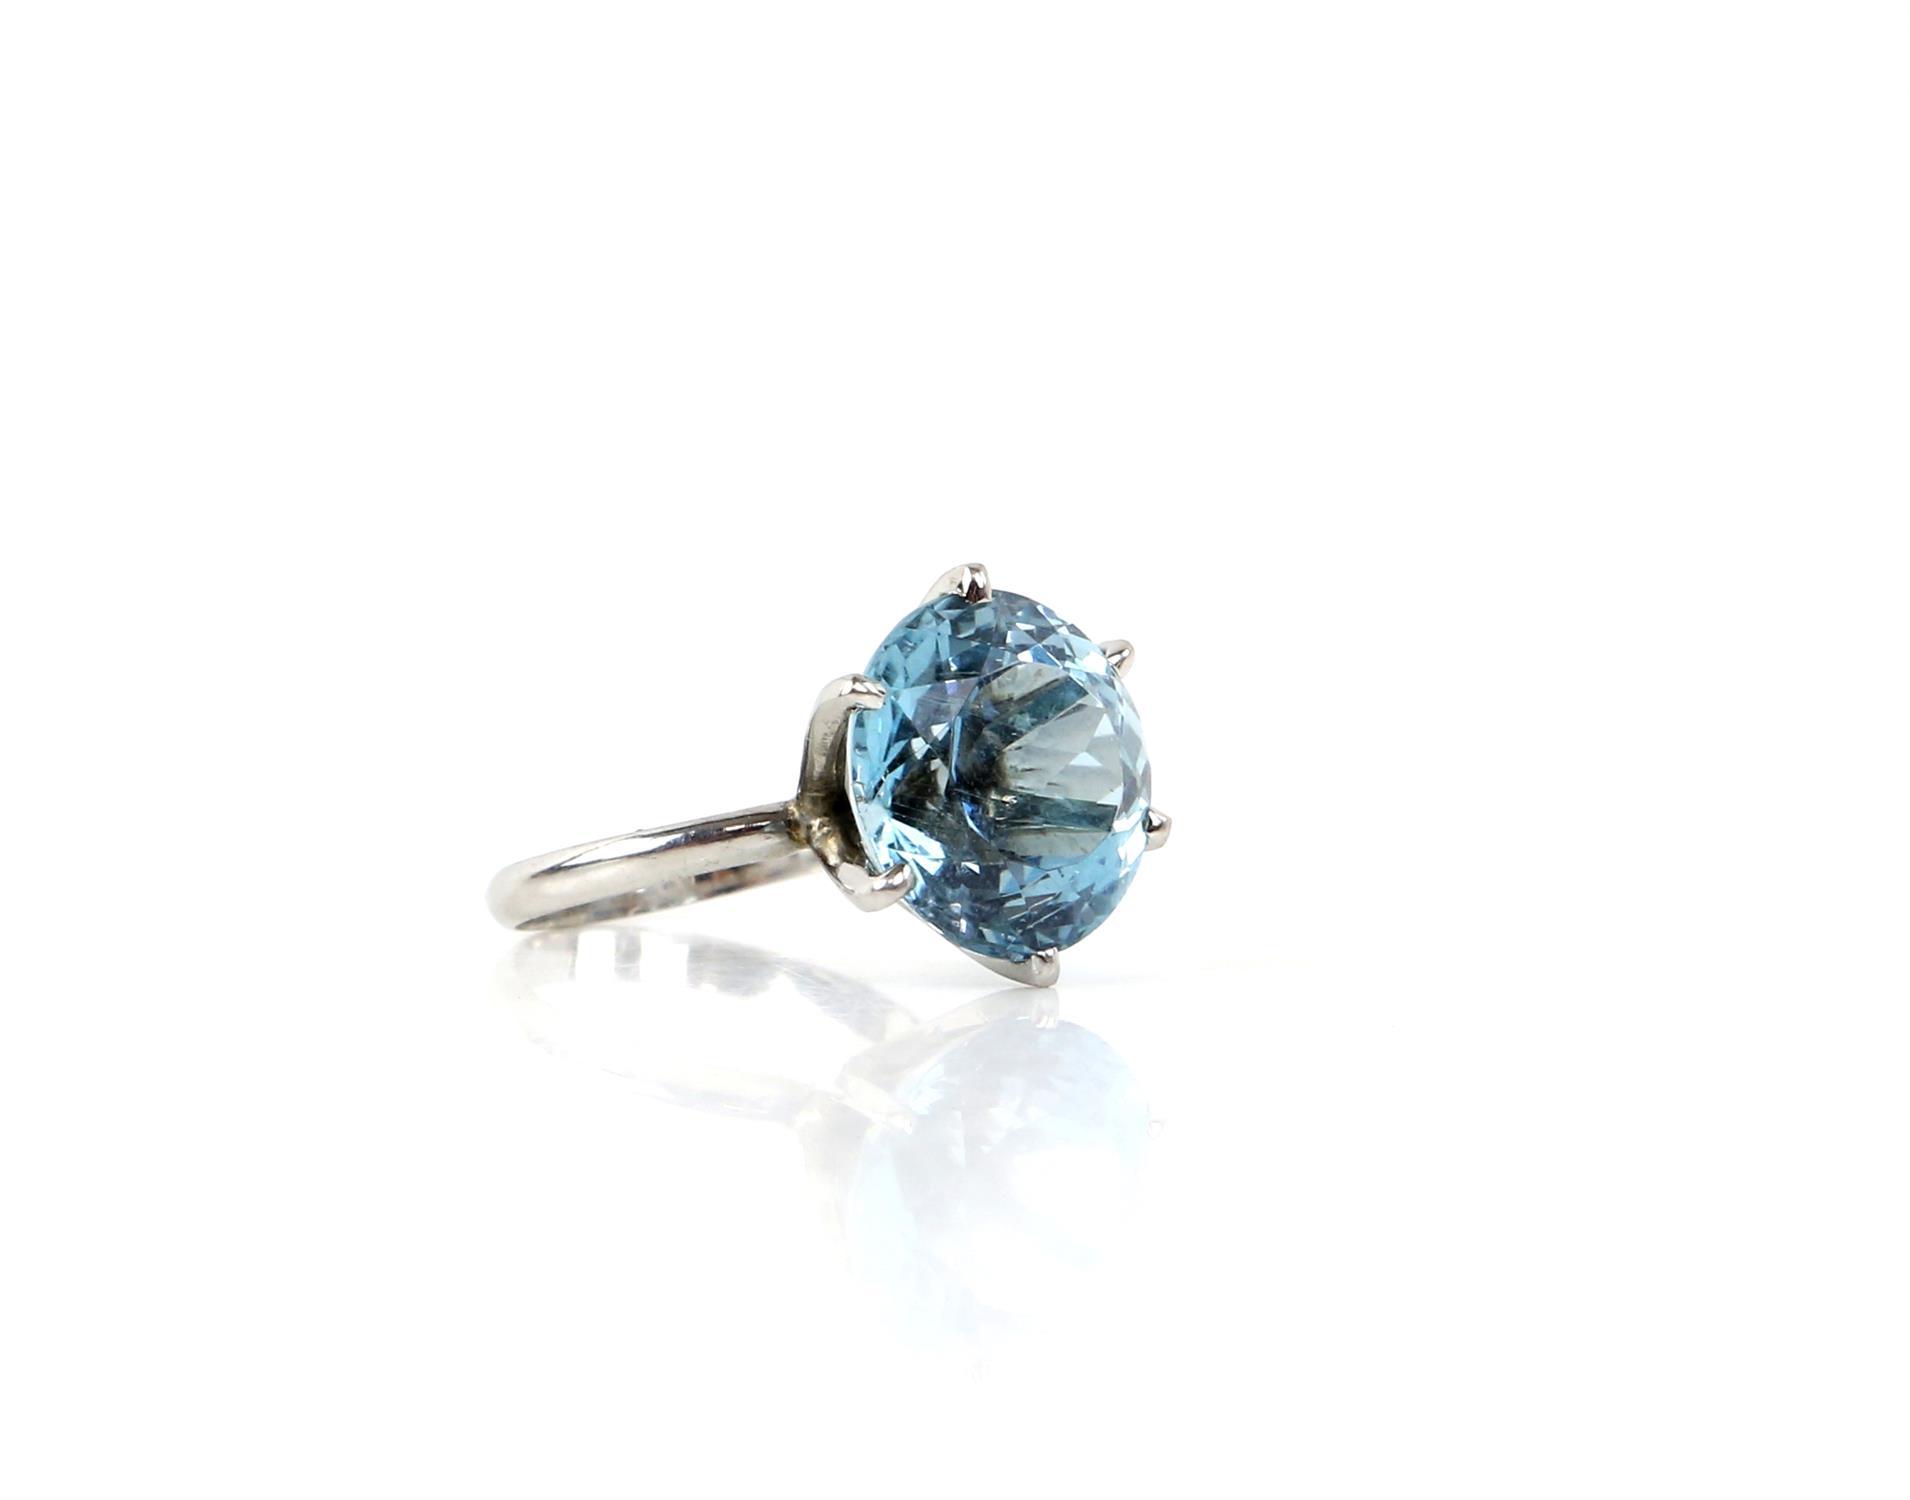 Aquamarine ring, round cut aquamarine, estimated weight 8.80 carats, mount testing as 18 ct, - Image 3 of 9